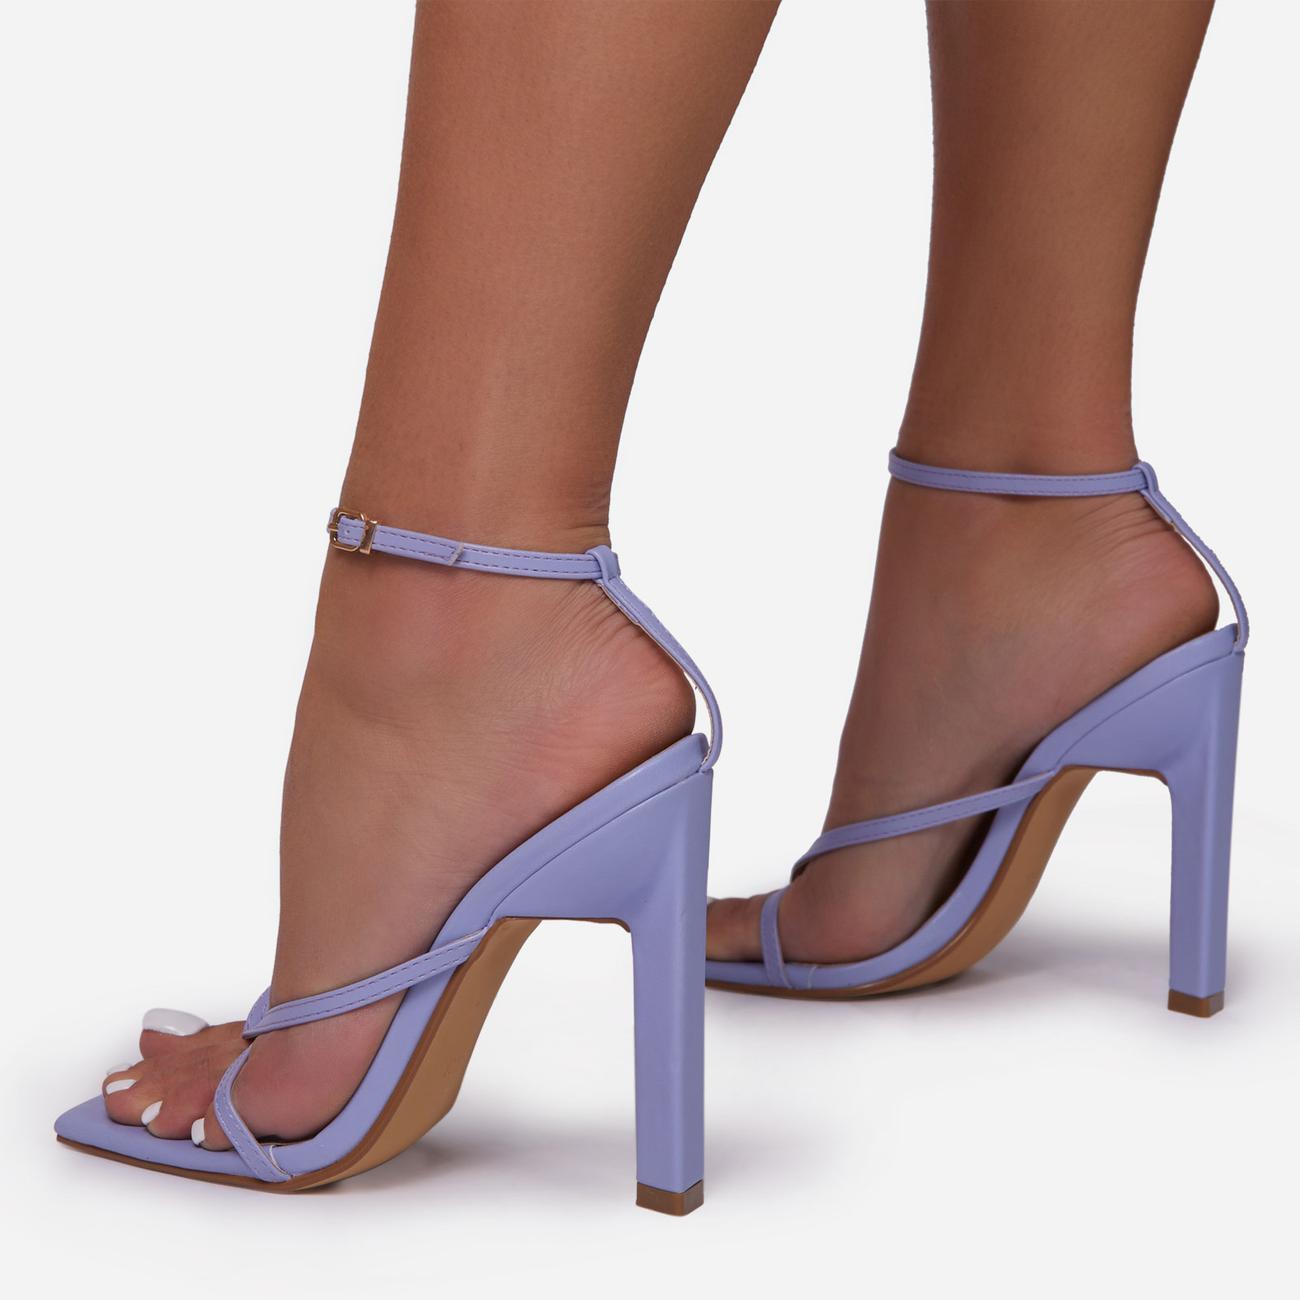 Enlighten Criss Cross Square Toe Sculptured Block Heel In Lilac Faux Leather Image 3